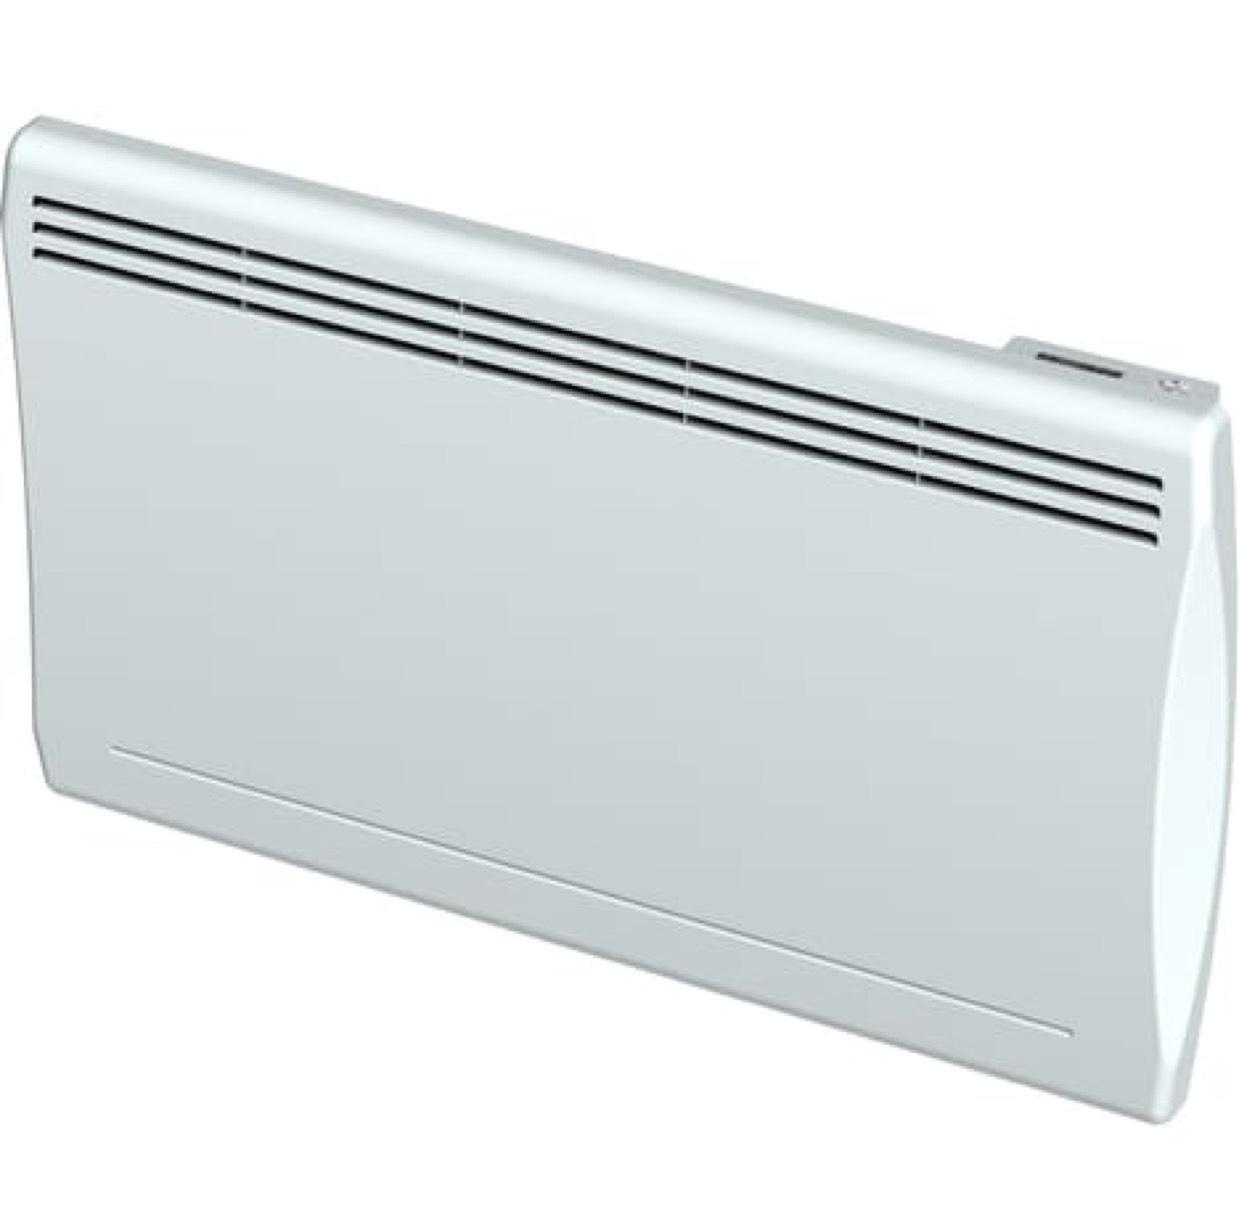 radiateur a inertie ceramique radiateur schema chauffage radiateur inertie castorama alpina. Black Bedroom Furniture Sets. Home Design Ideas